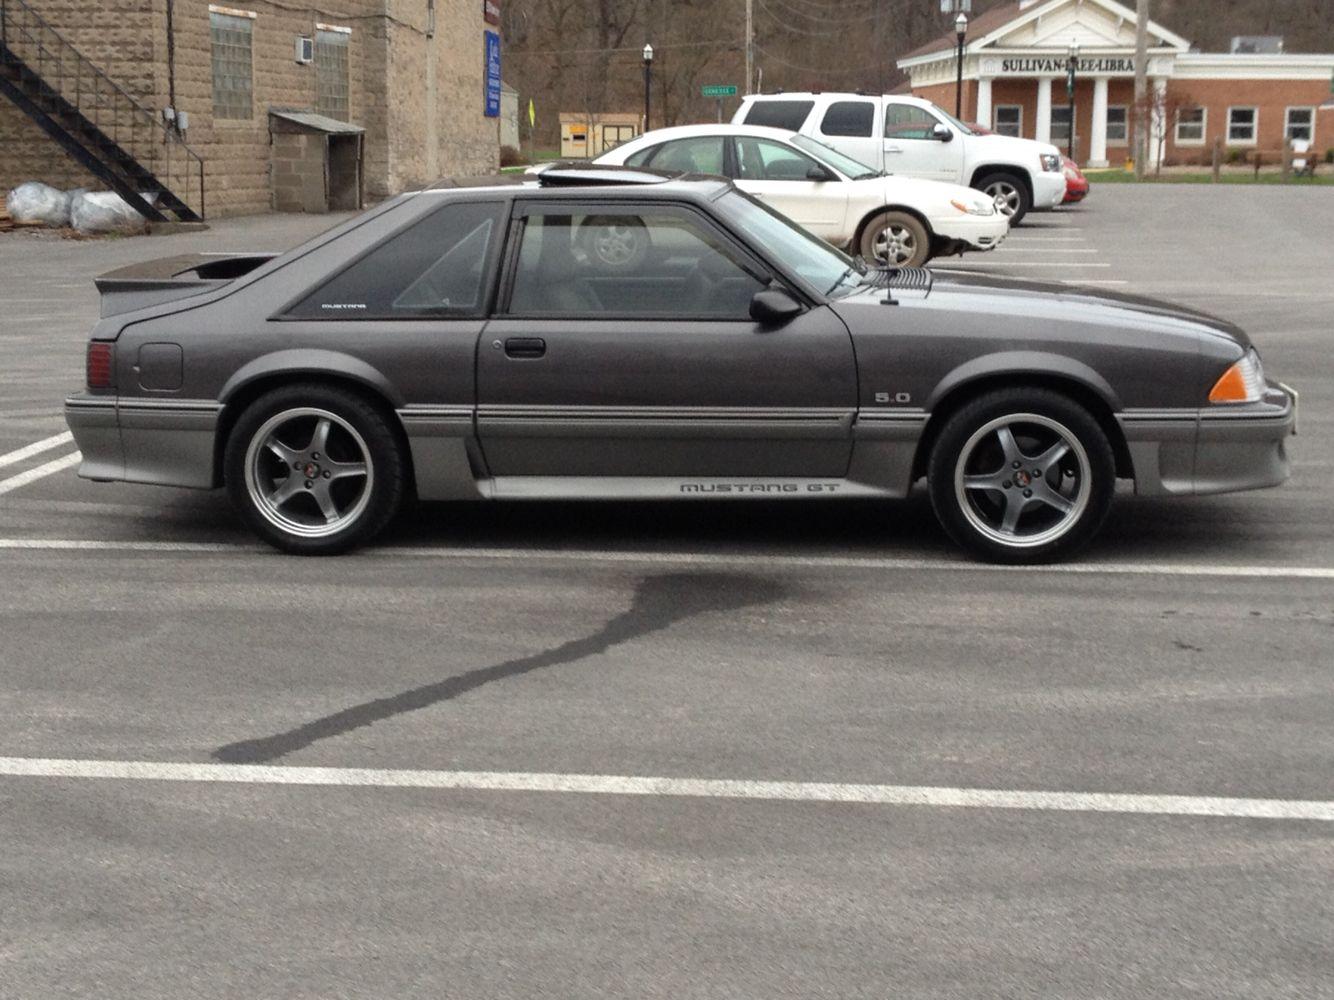 91 Mustang Gt >> 91 Mustang Gt 1991 Ford Mustang Gt Fox Body Mustang Fox Mustang